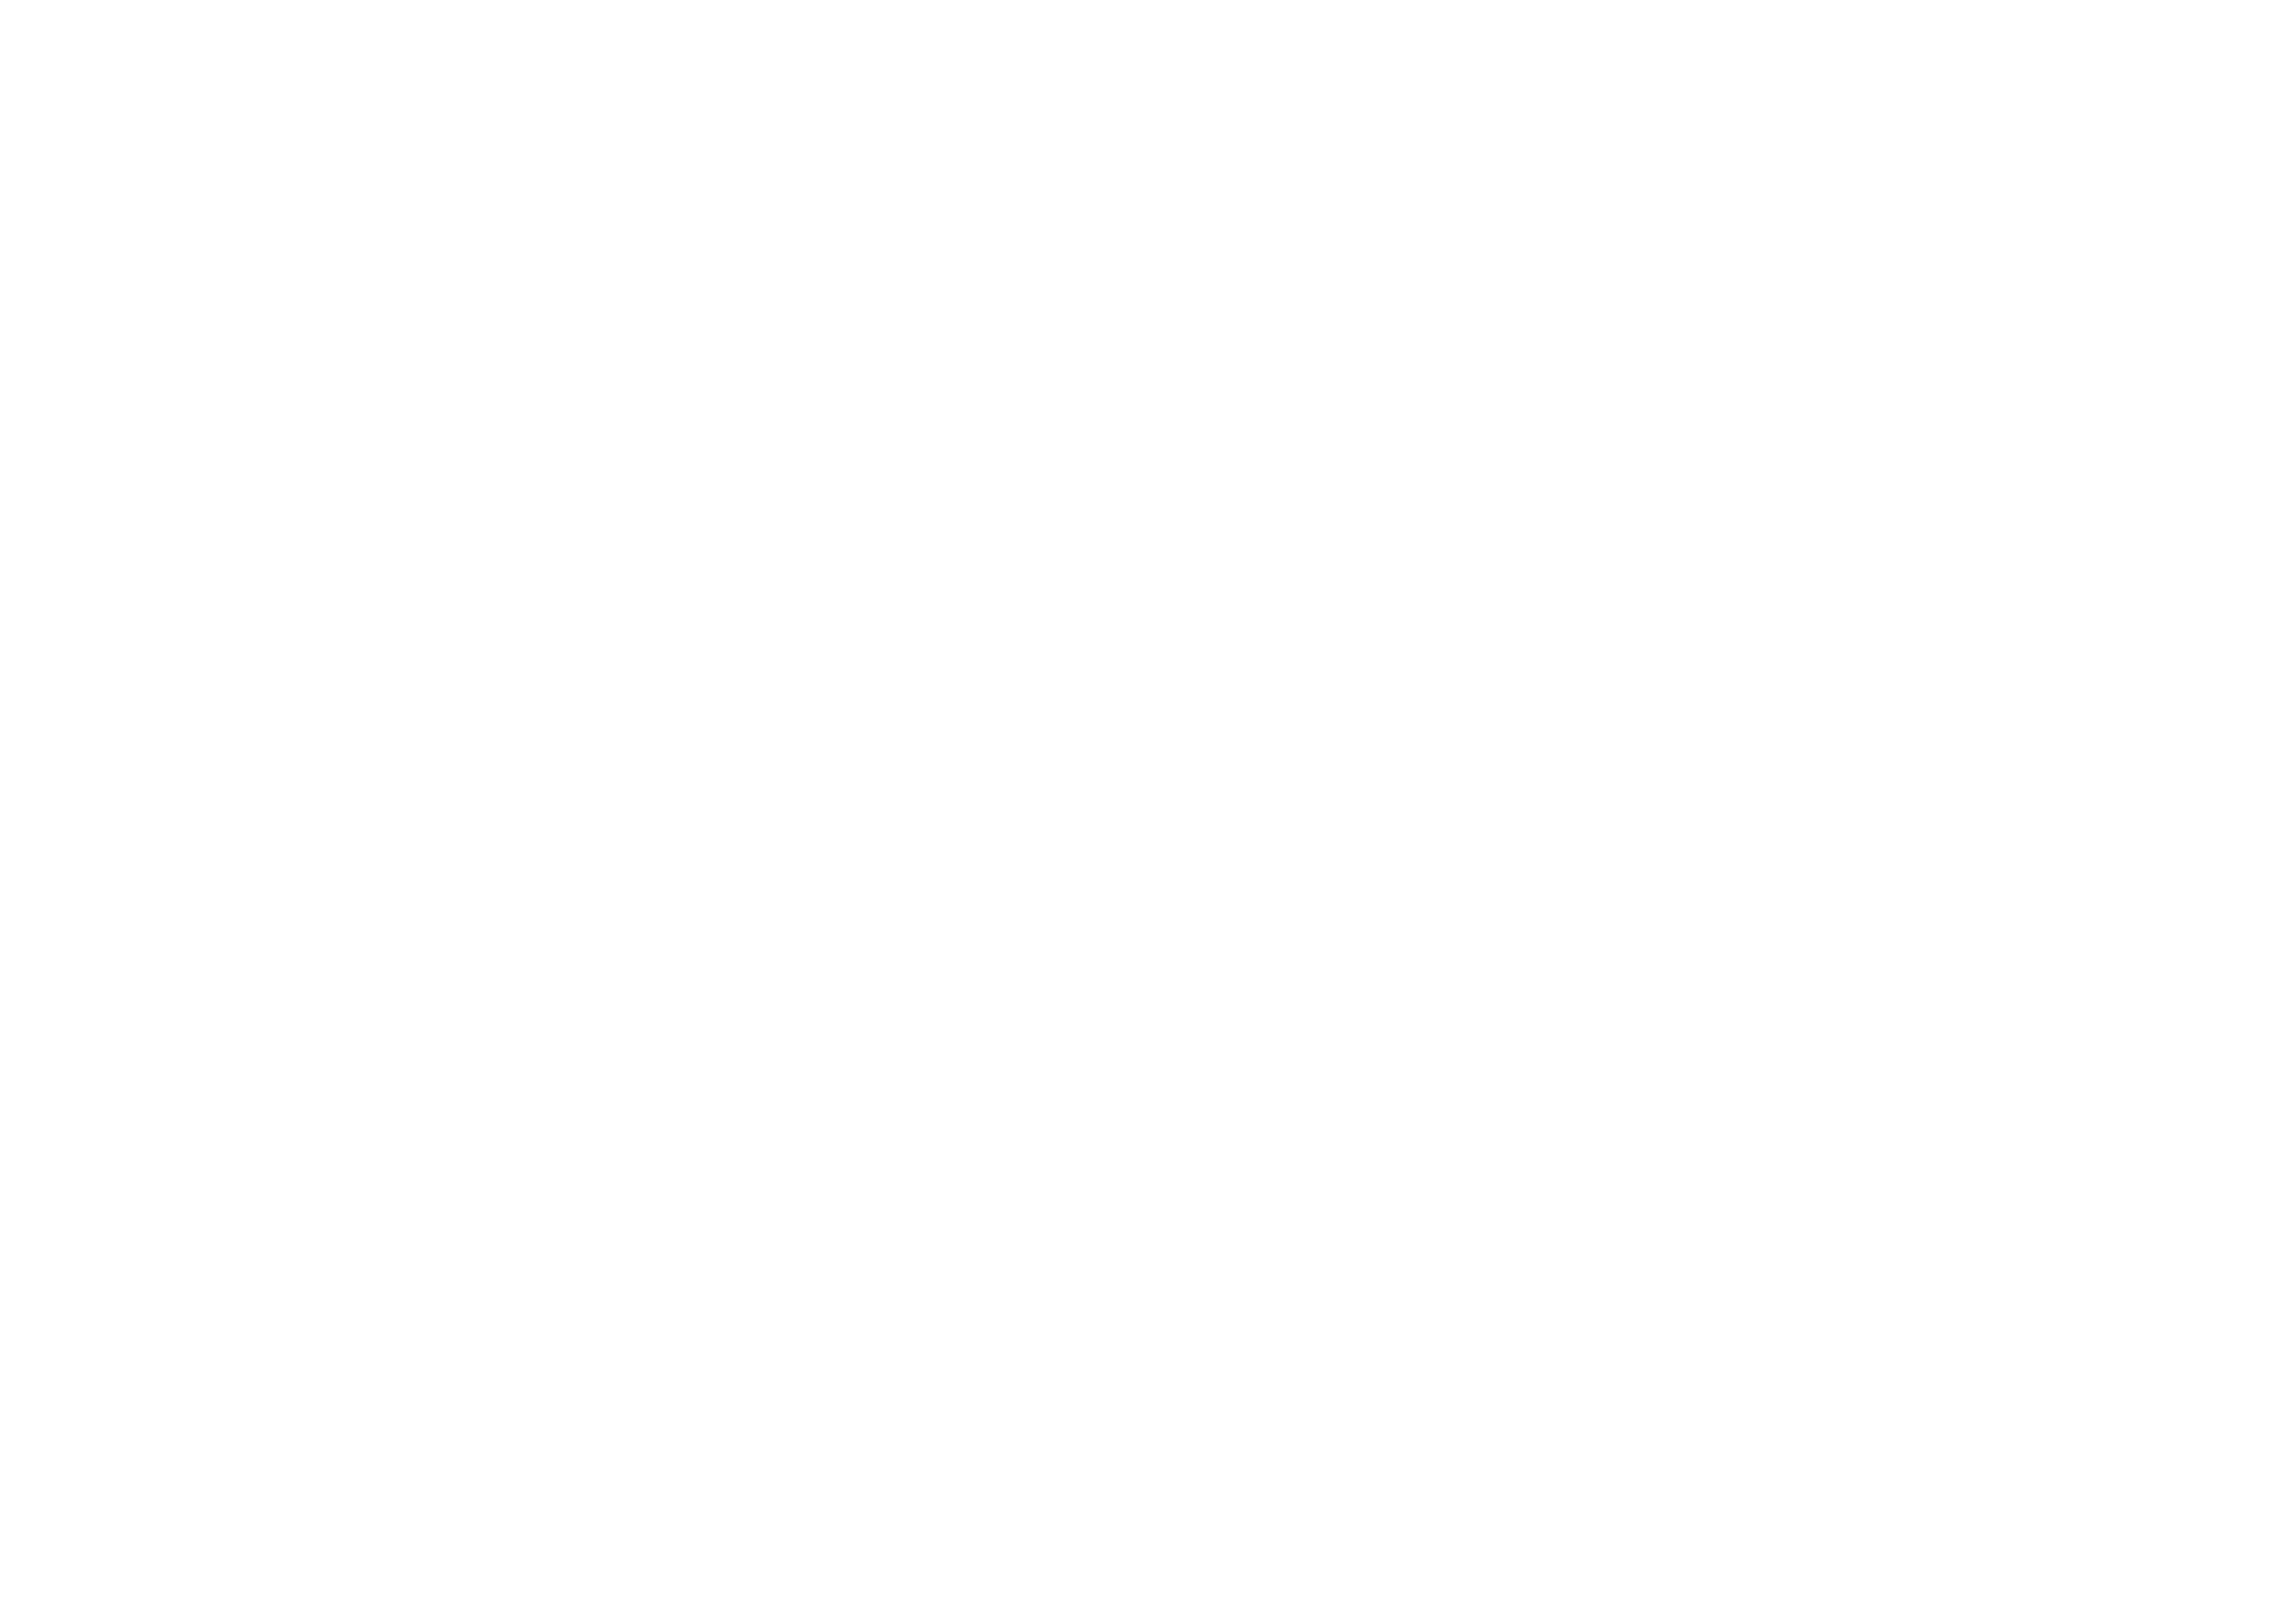 J.Iwanicka white-01